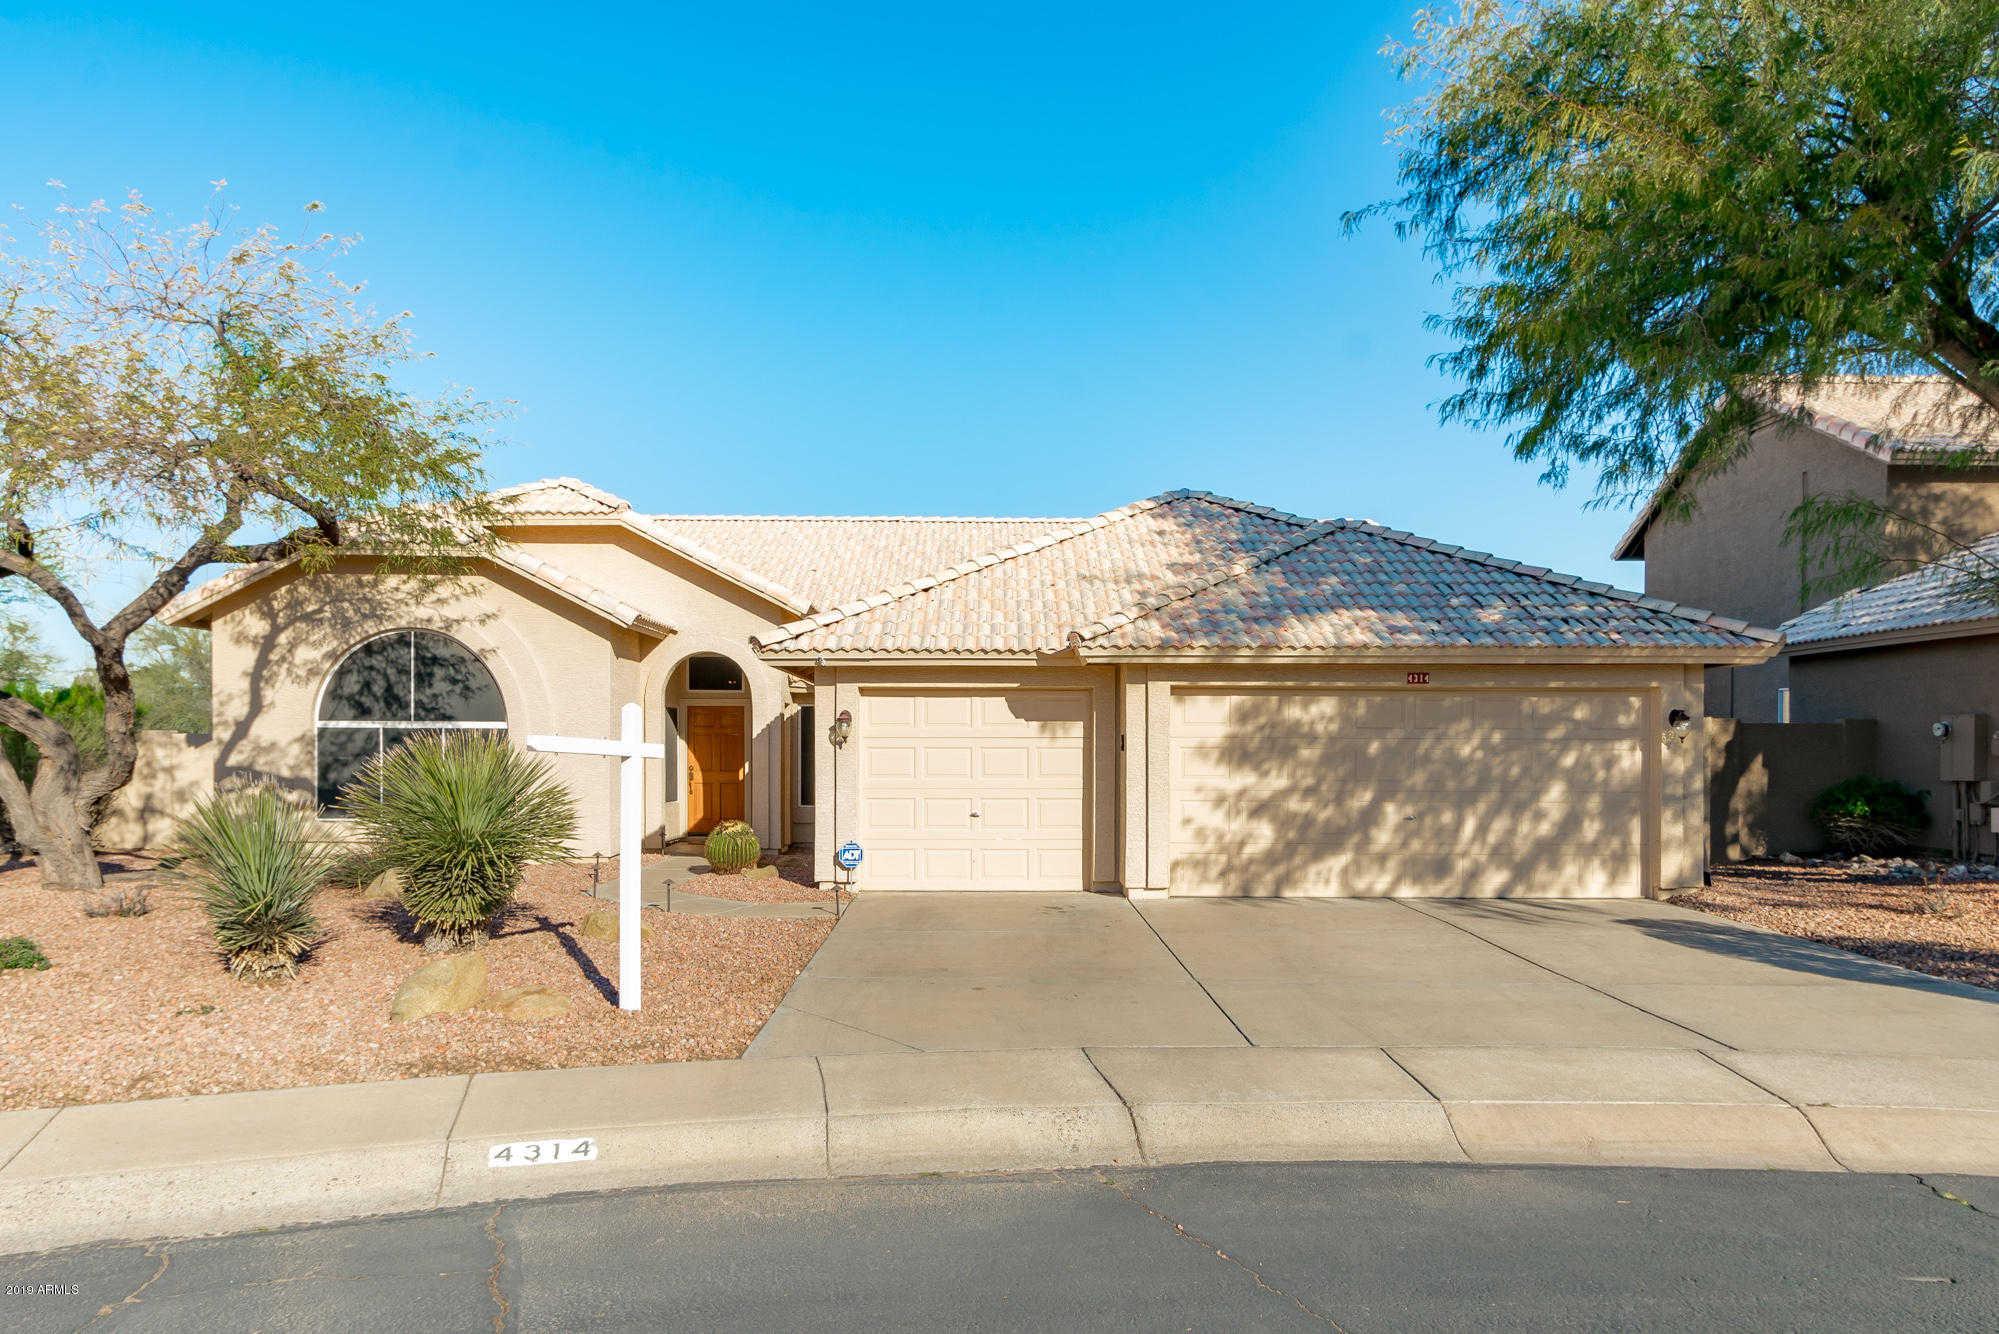 $449,900 - 4Br/2Ba - Home for Sale in Tatum Ranch Parcel 13 Lot 1-84, Cave Creek